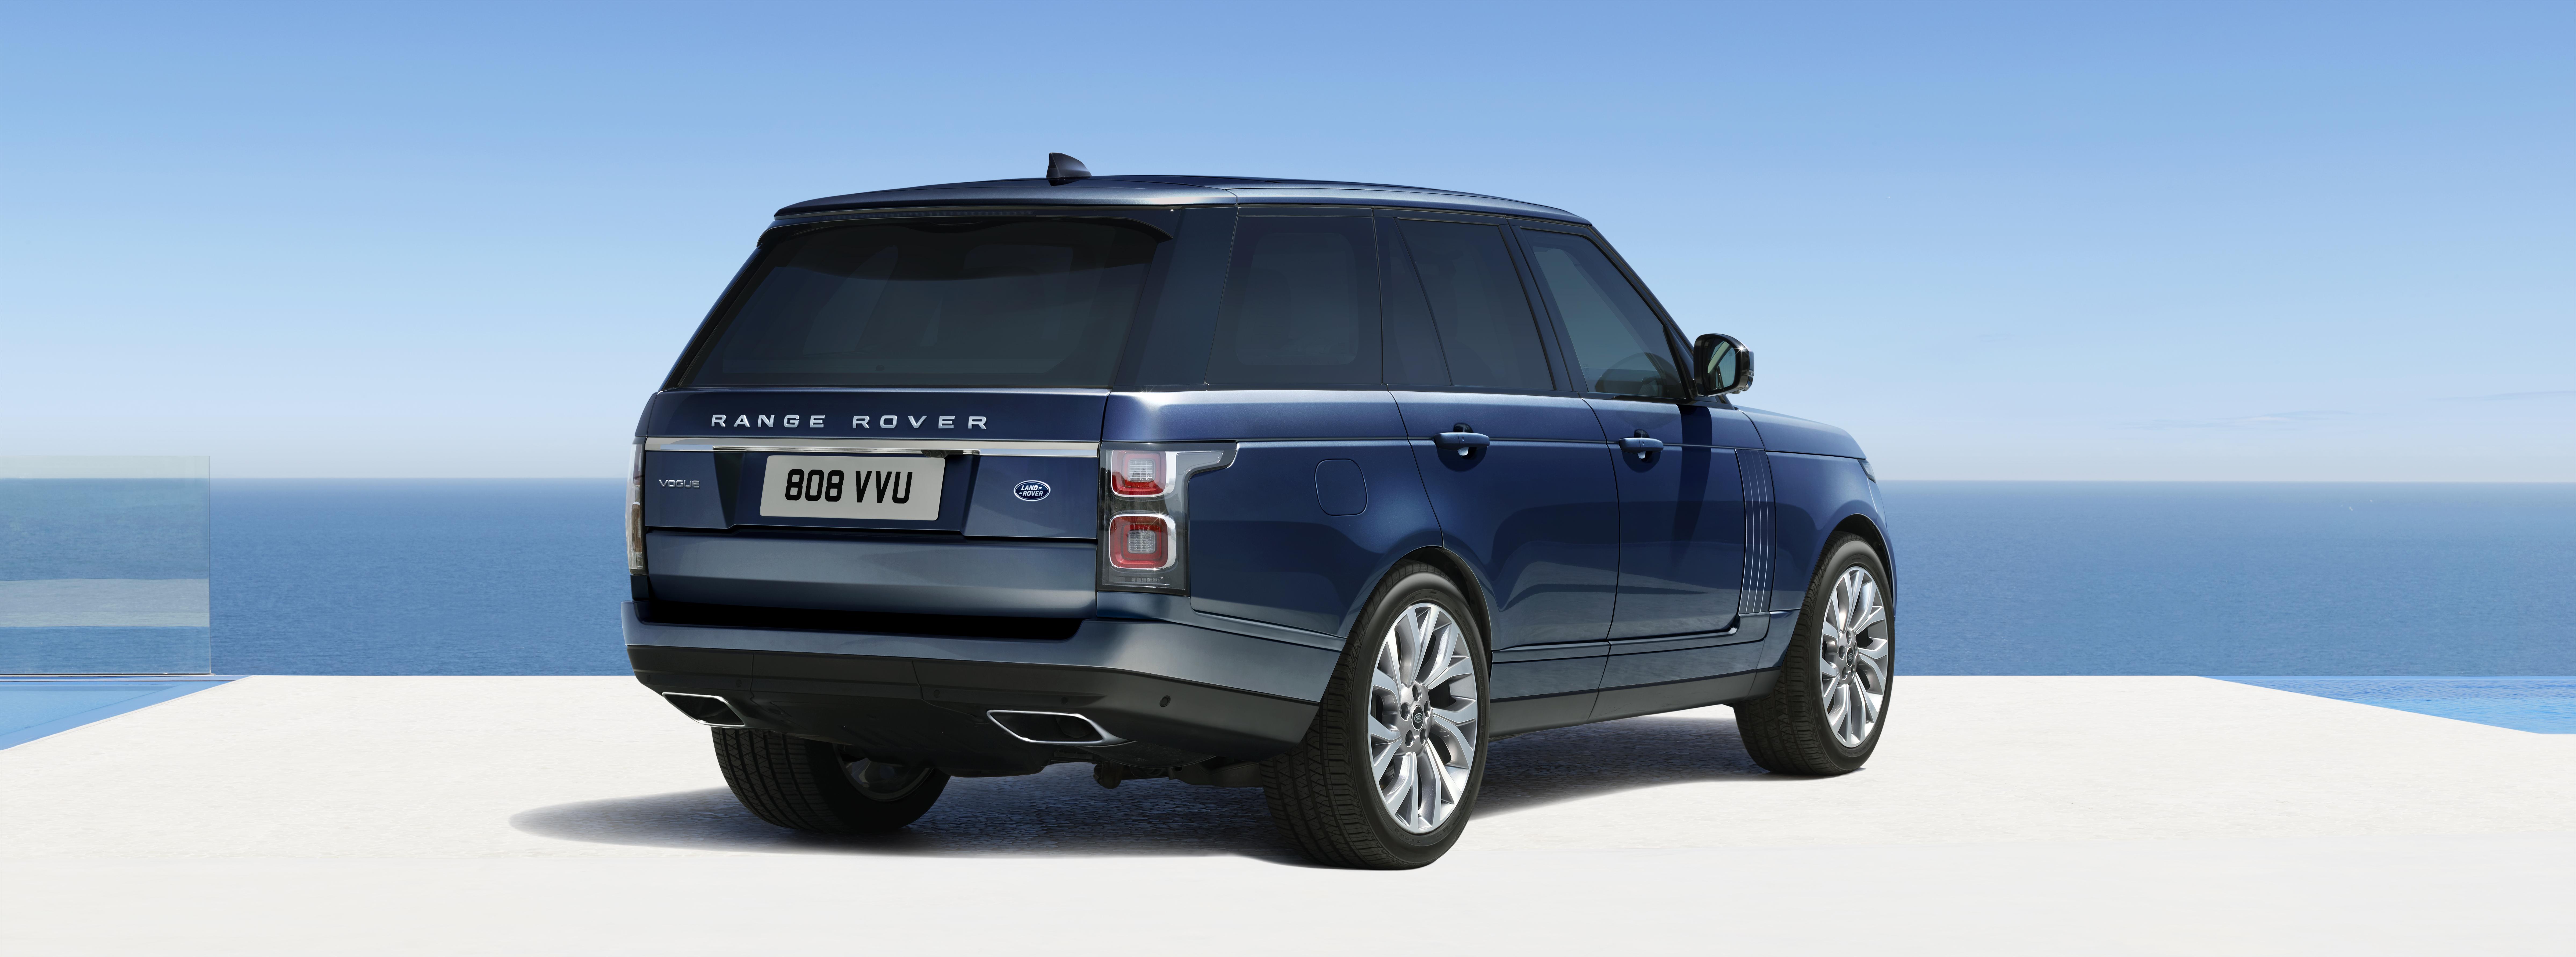 RR 21MY WESTMINSTER 150720 03 Revisión del Range Rover HSE Westminster 2021